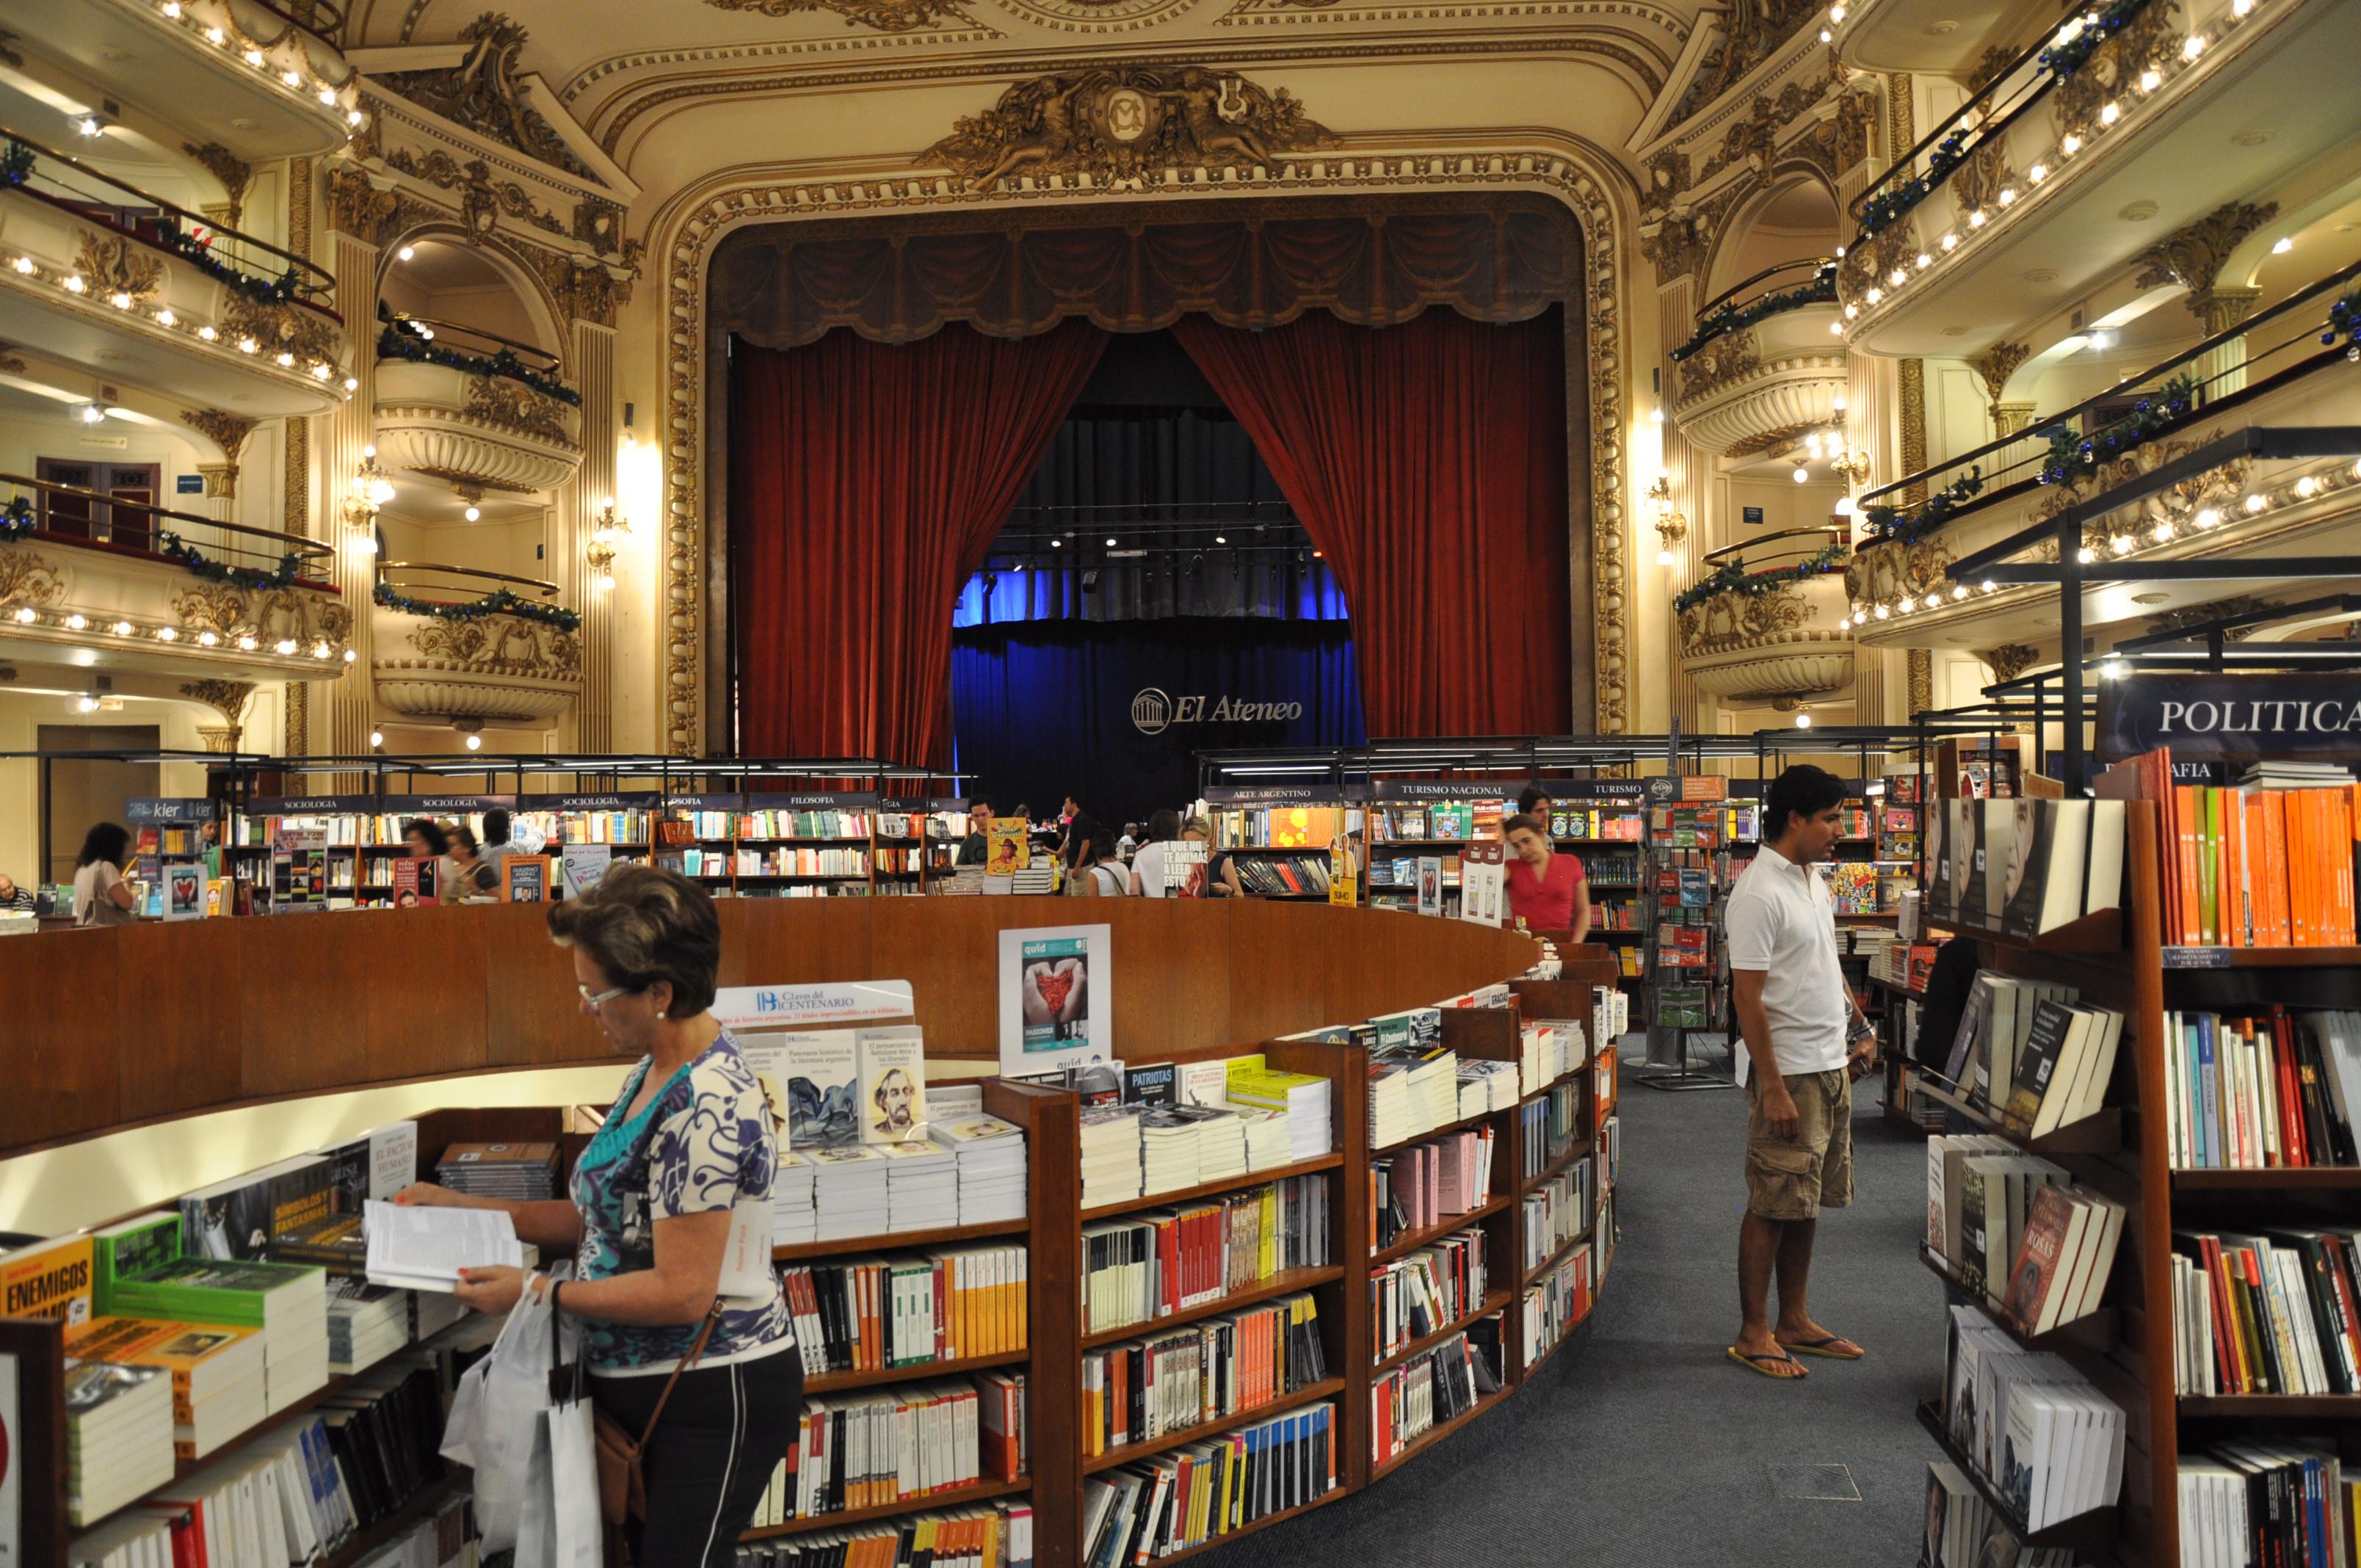 El-Ateneo-Interior-Lascar bookstore